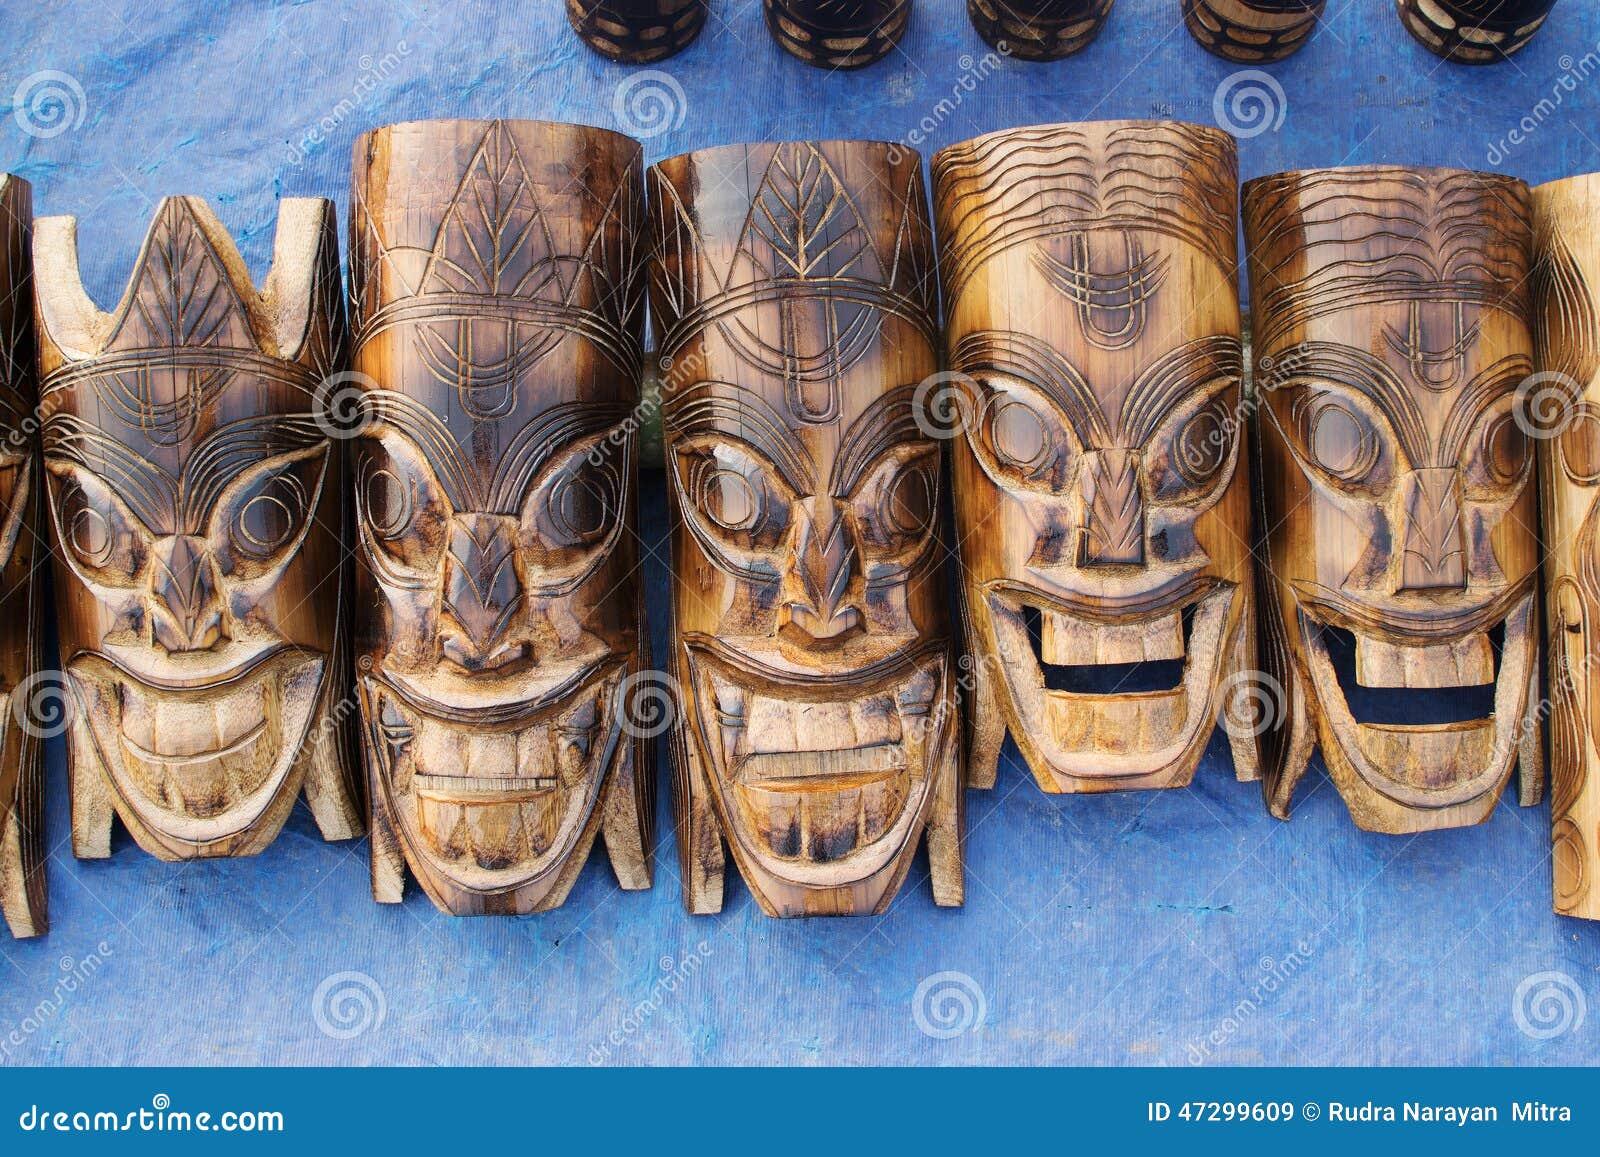 Wooden Masks Indian Handicrafts Fair At Kolkata Editorial Stock